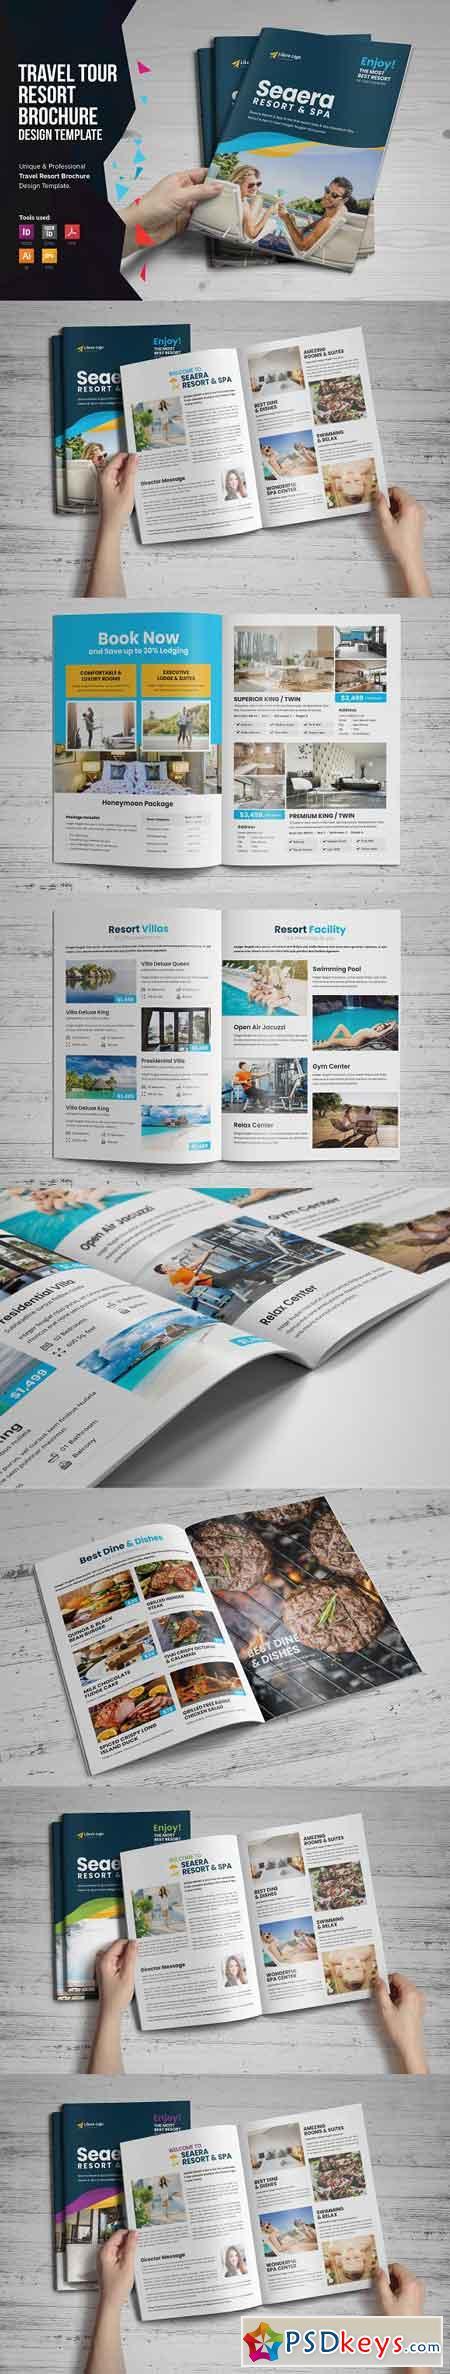 Travel Resort Brochure Design v1 3319197